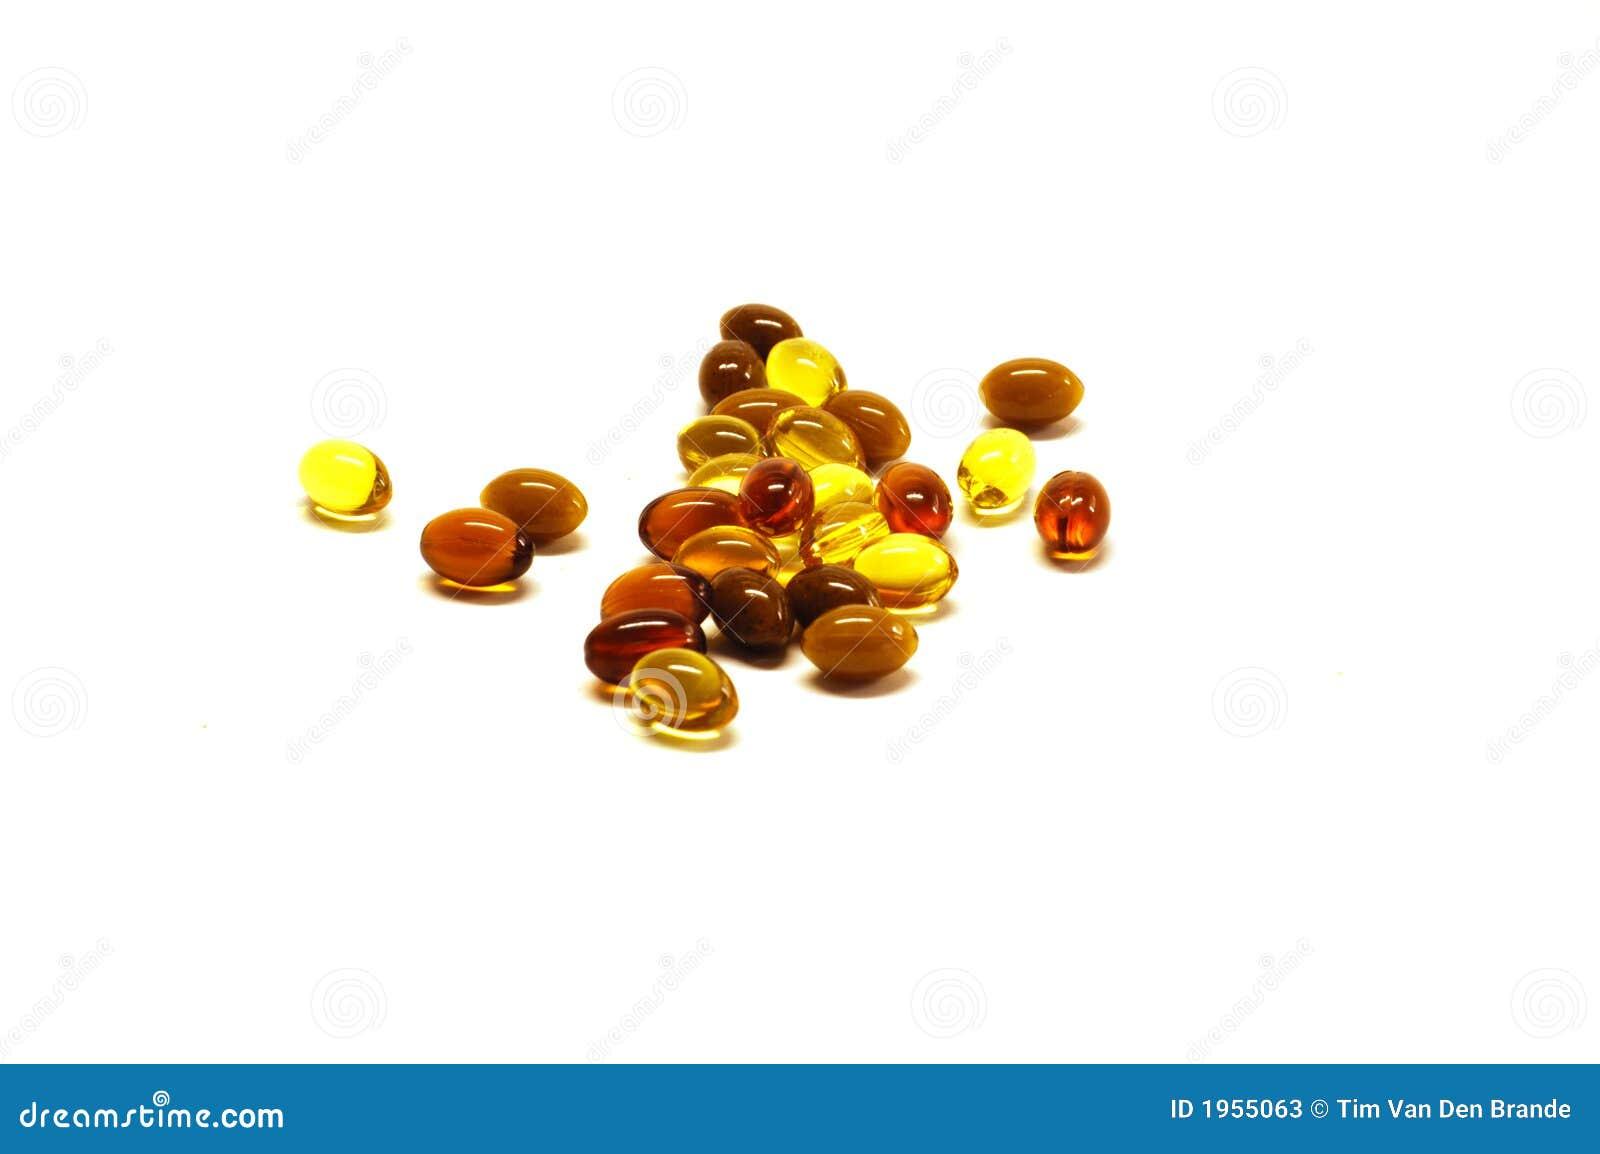 Daily Vitamines